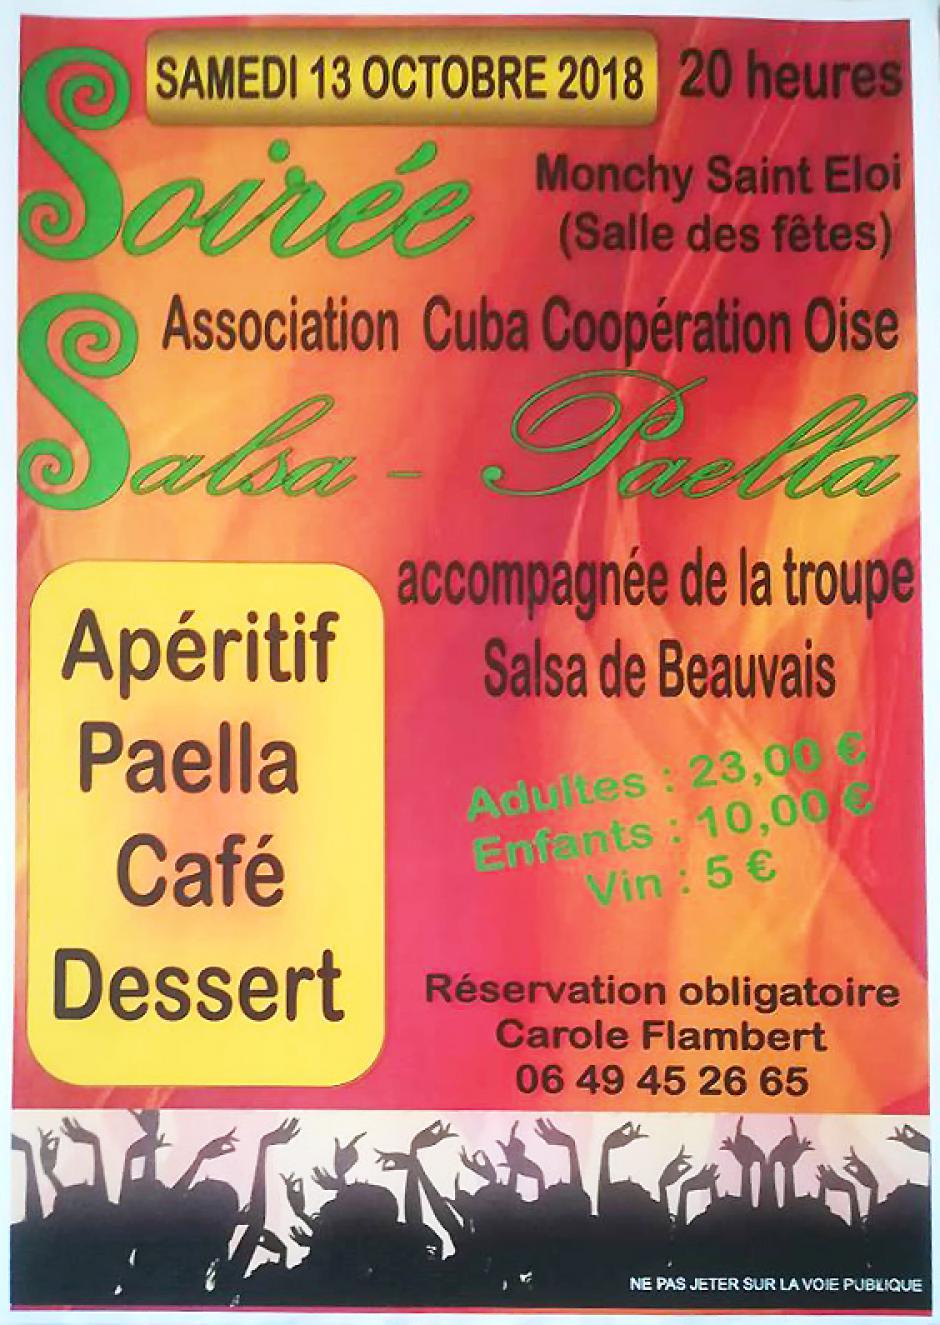 13 octobre, Monchy-Saint-Éloi - Cuba Coop Oise-Soirée salsa paella